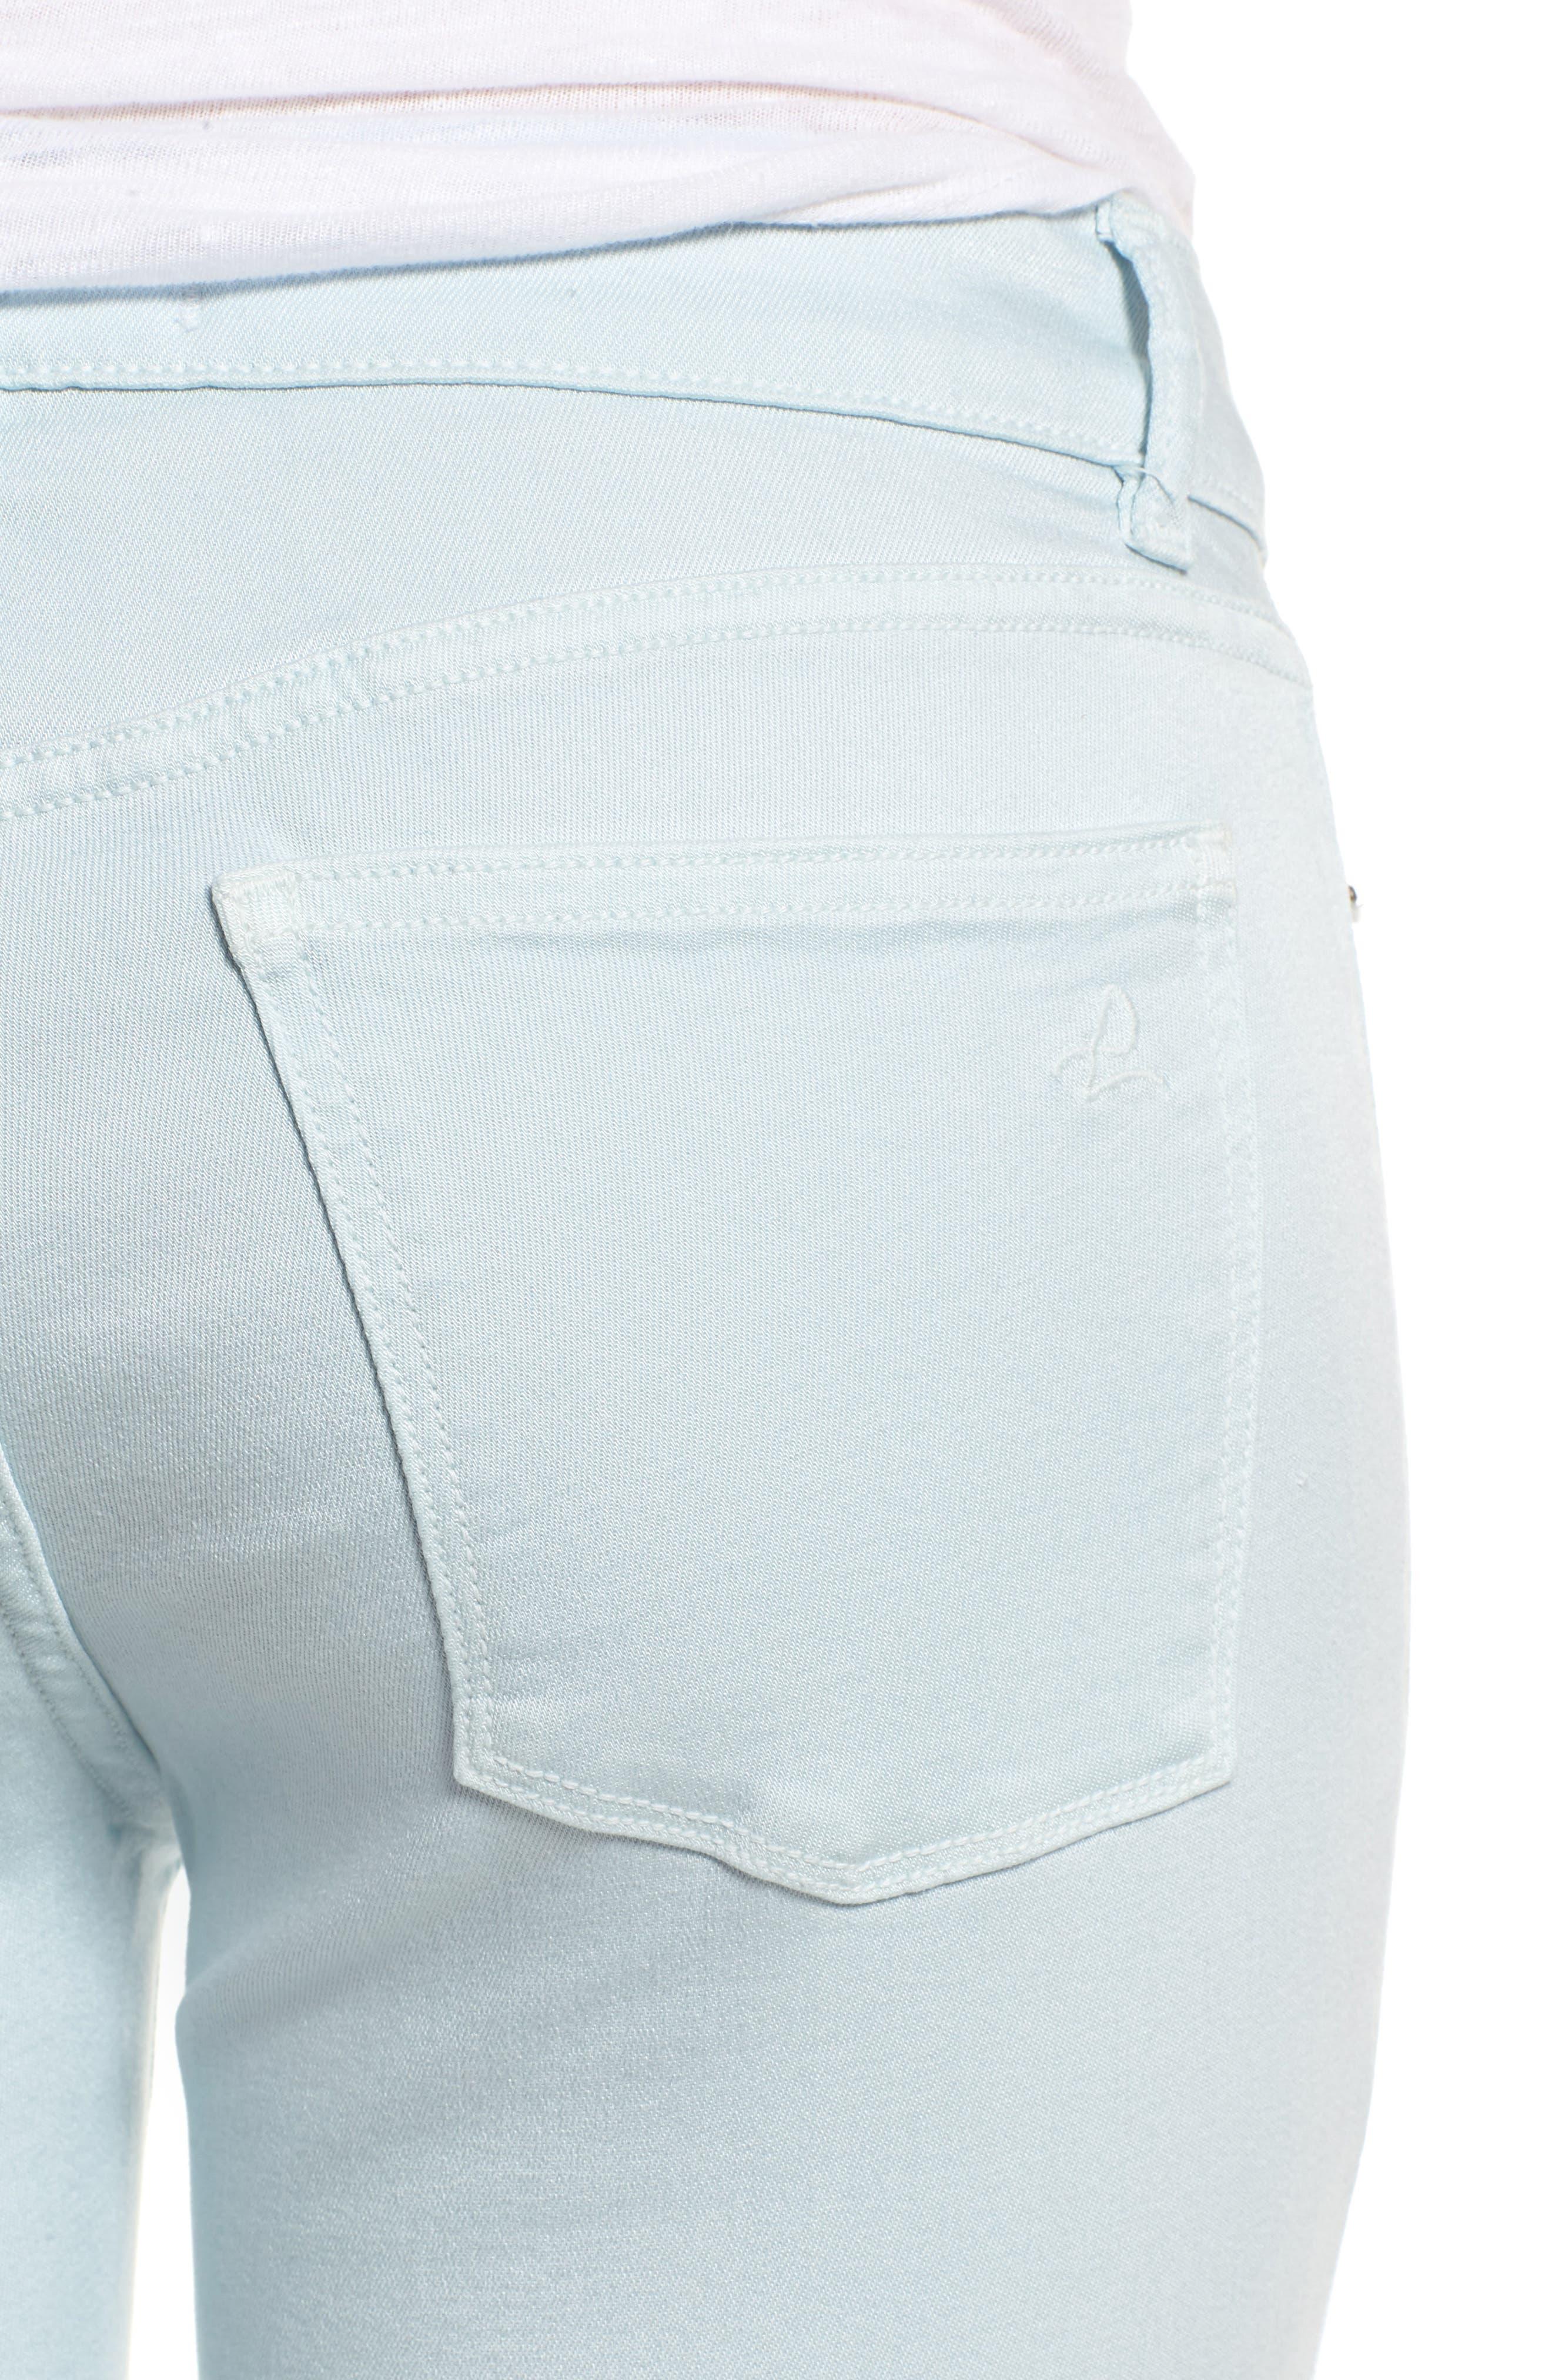 Florence Instasculpt Crop Skinny Jeans,                             Alternate thumbnail 4, color,                             Sky